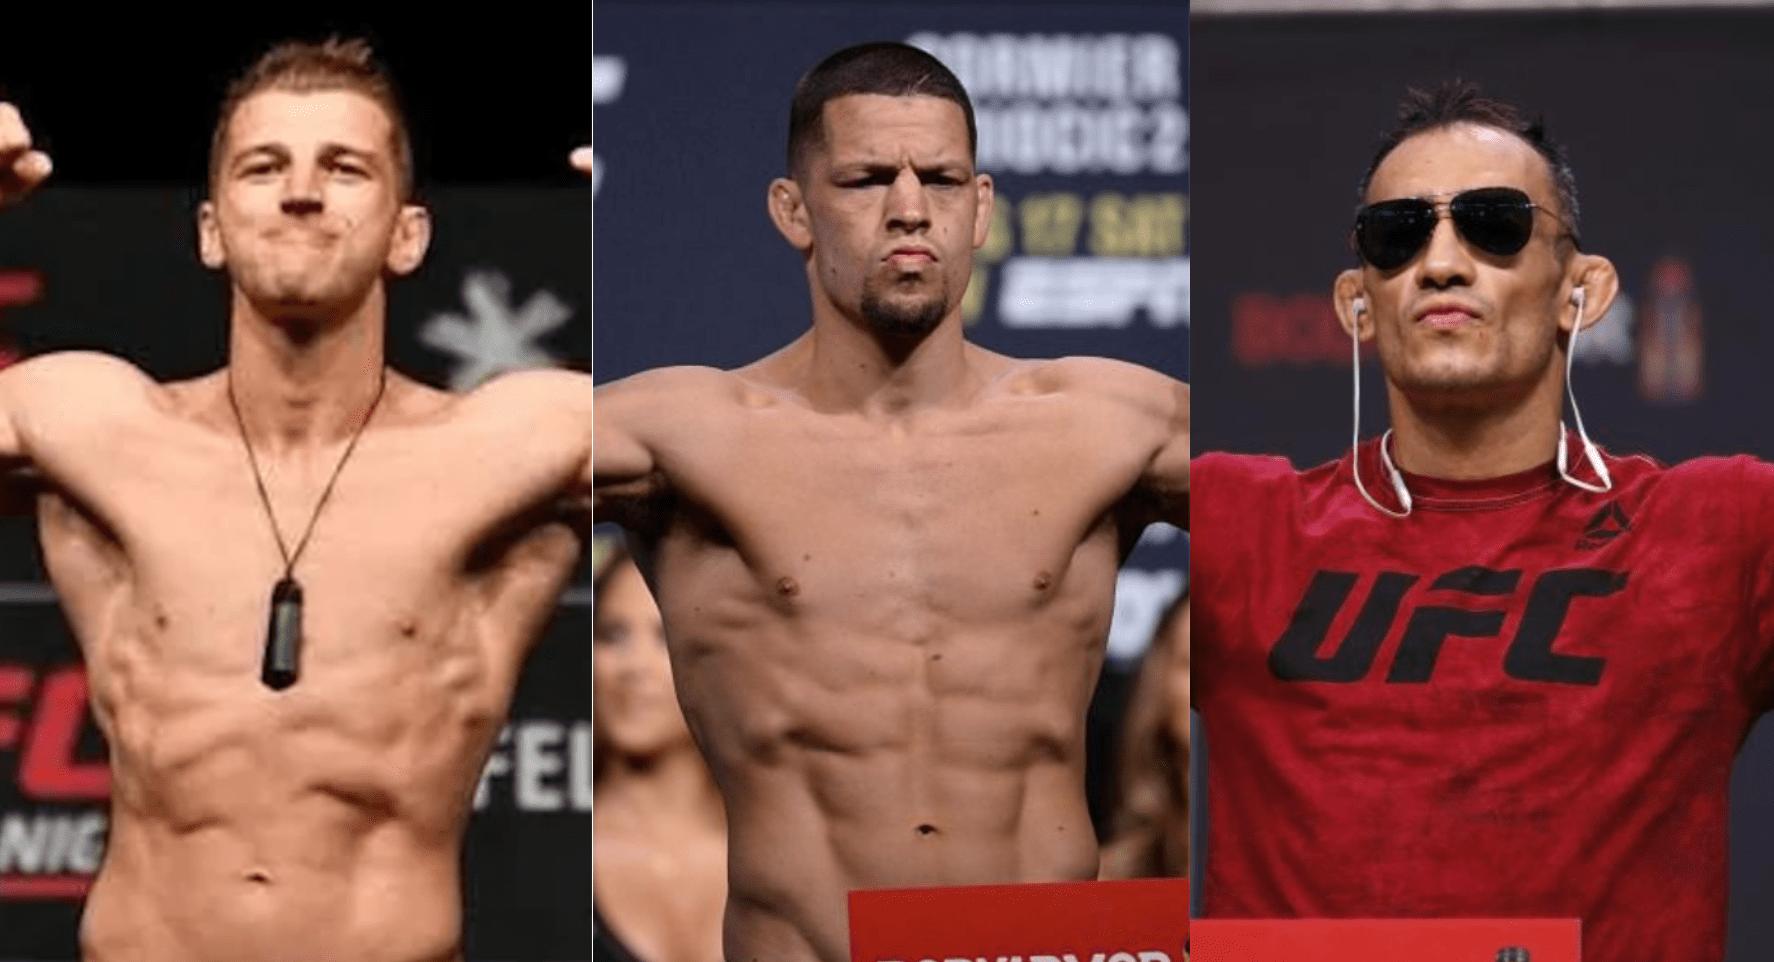 UFC: Dan Hooker Calls Out Nate Diaz And Tony Ferguson